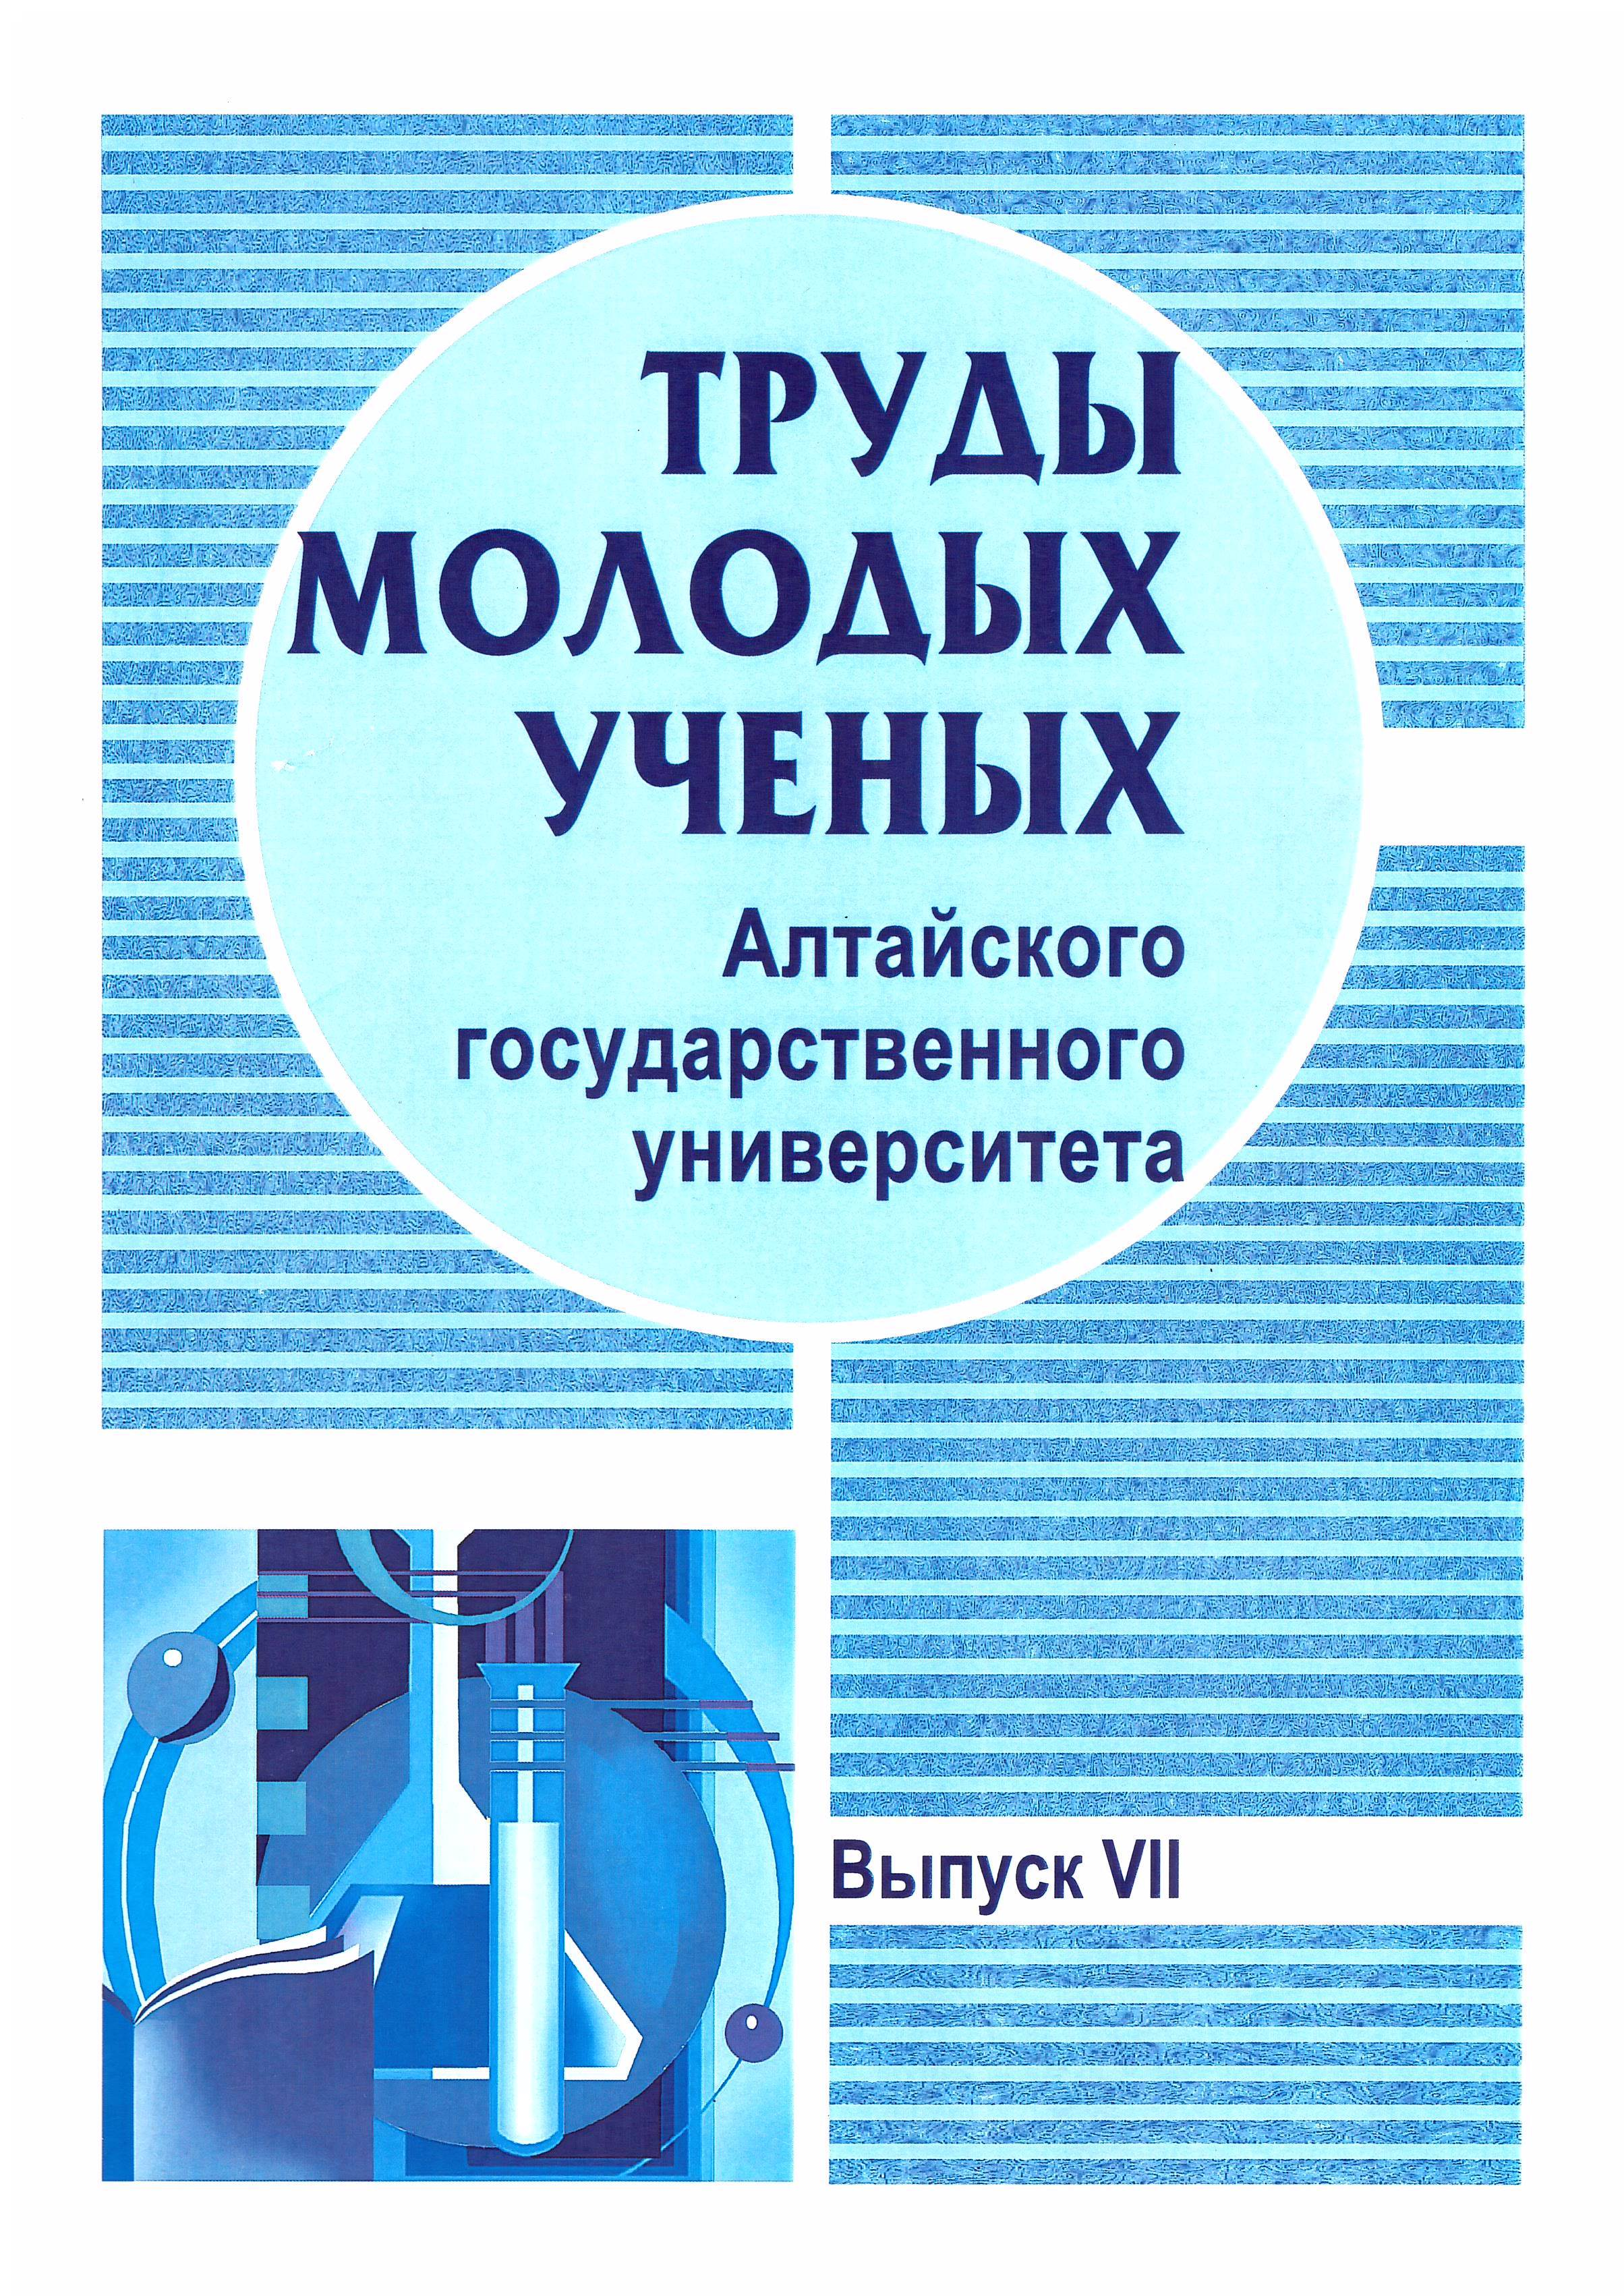 Труды молодых ученых выпуск 7